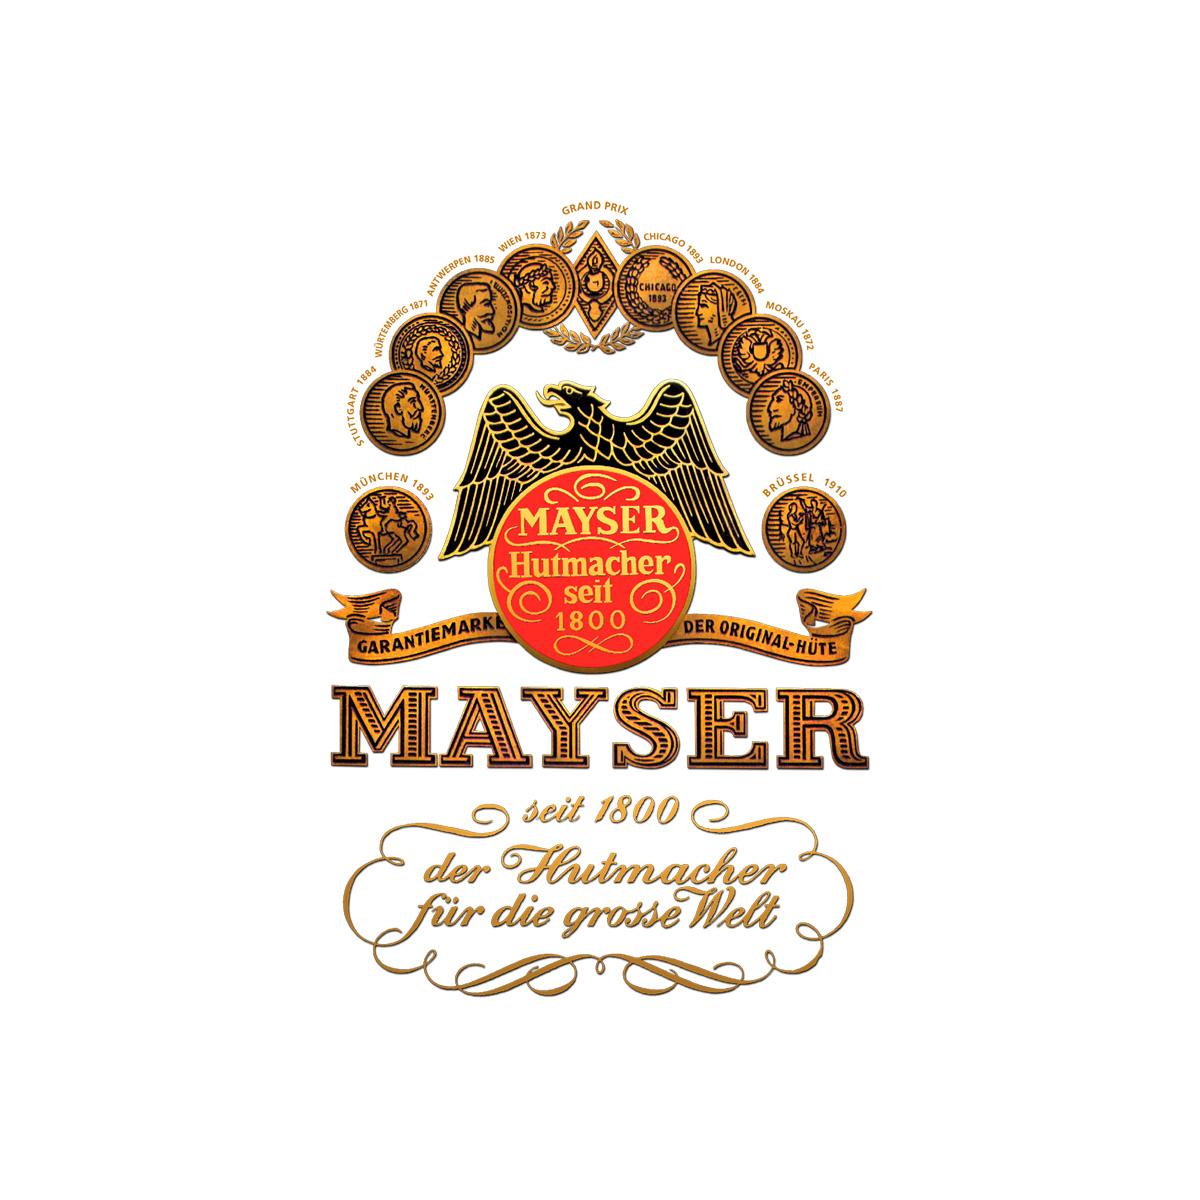 Mayser - klobouky a bekovky s tradicí